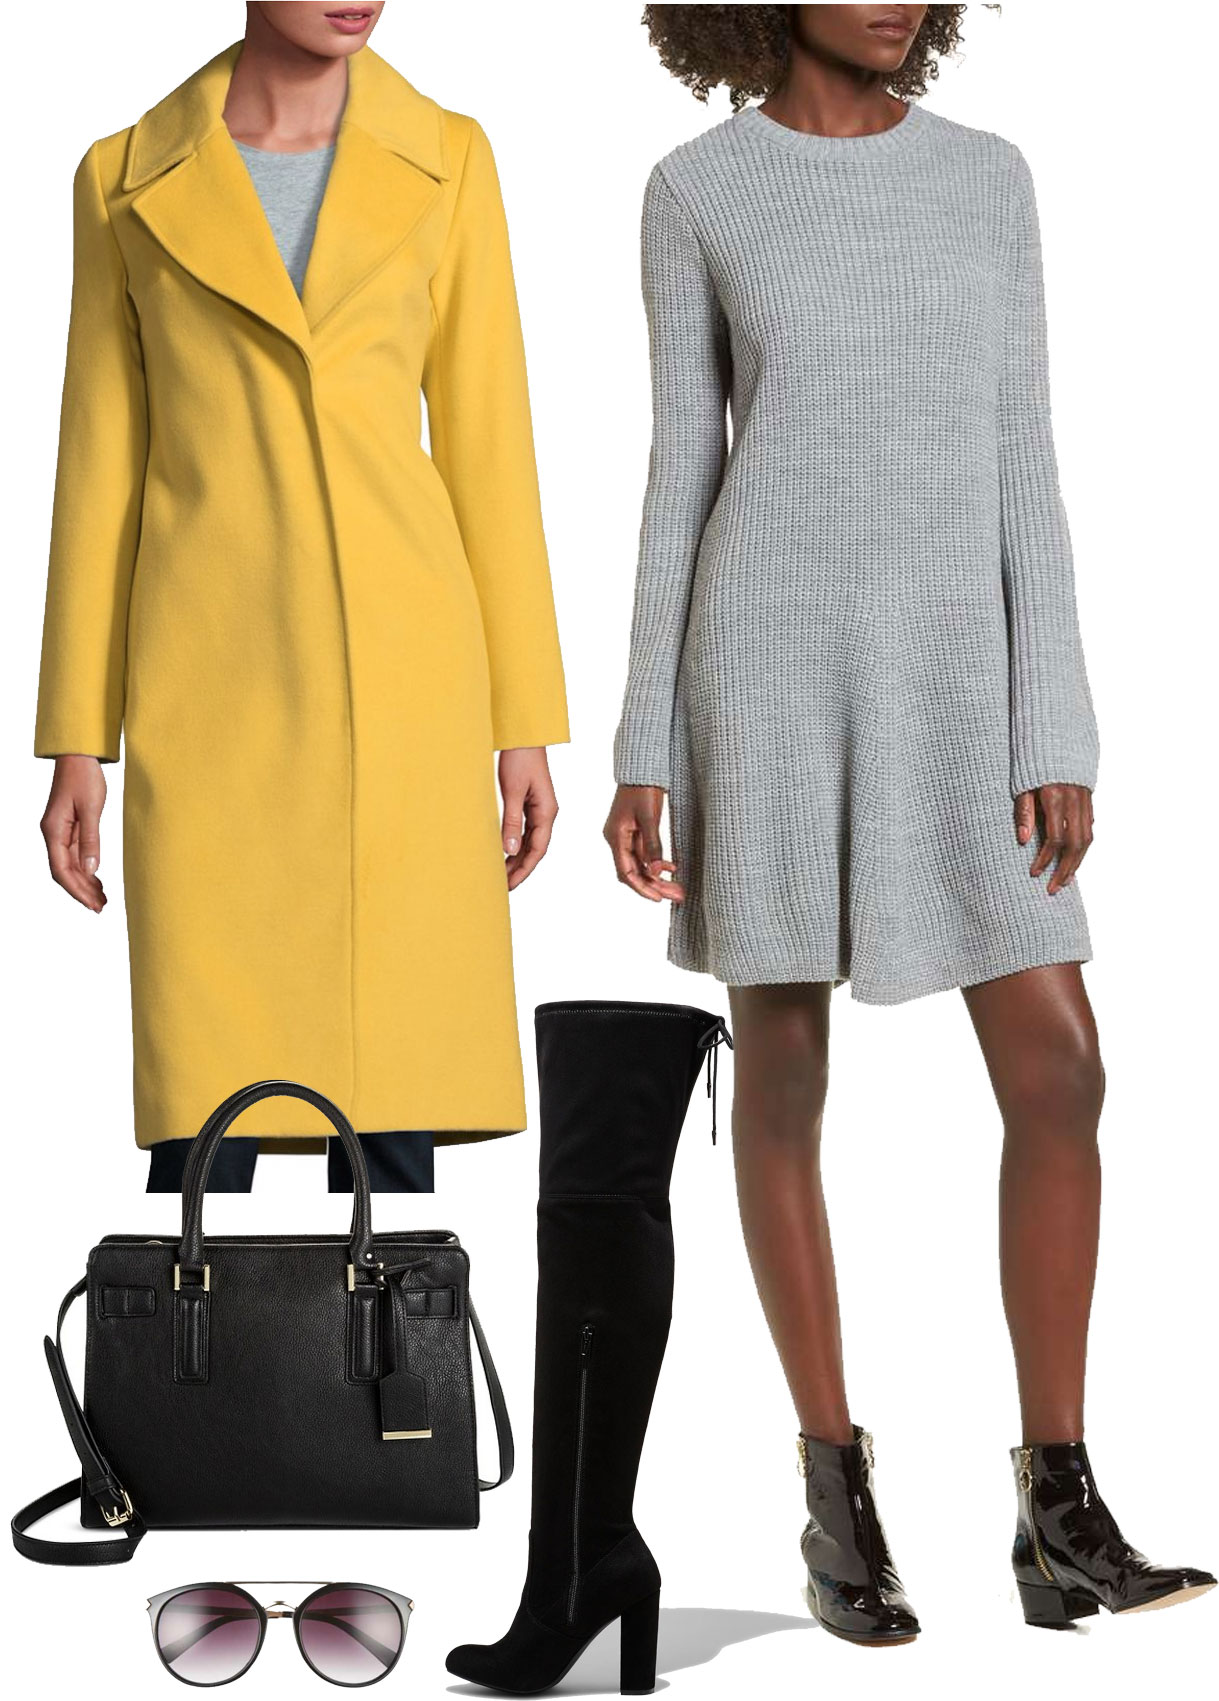 grayl-dress-sweater-yellow-jacket-coat-black-bag-sun-black-shoe-boots-otk-gabrielleunion-fall-winter-lunch.jpg